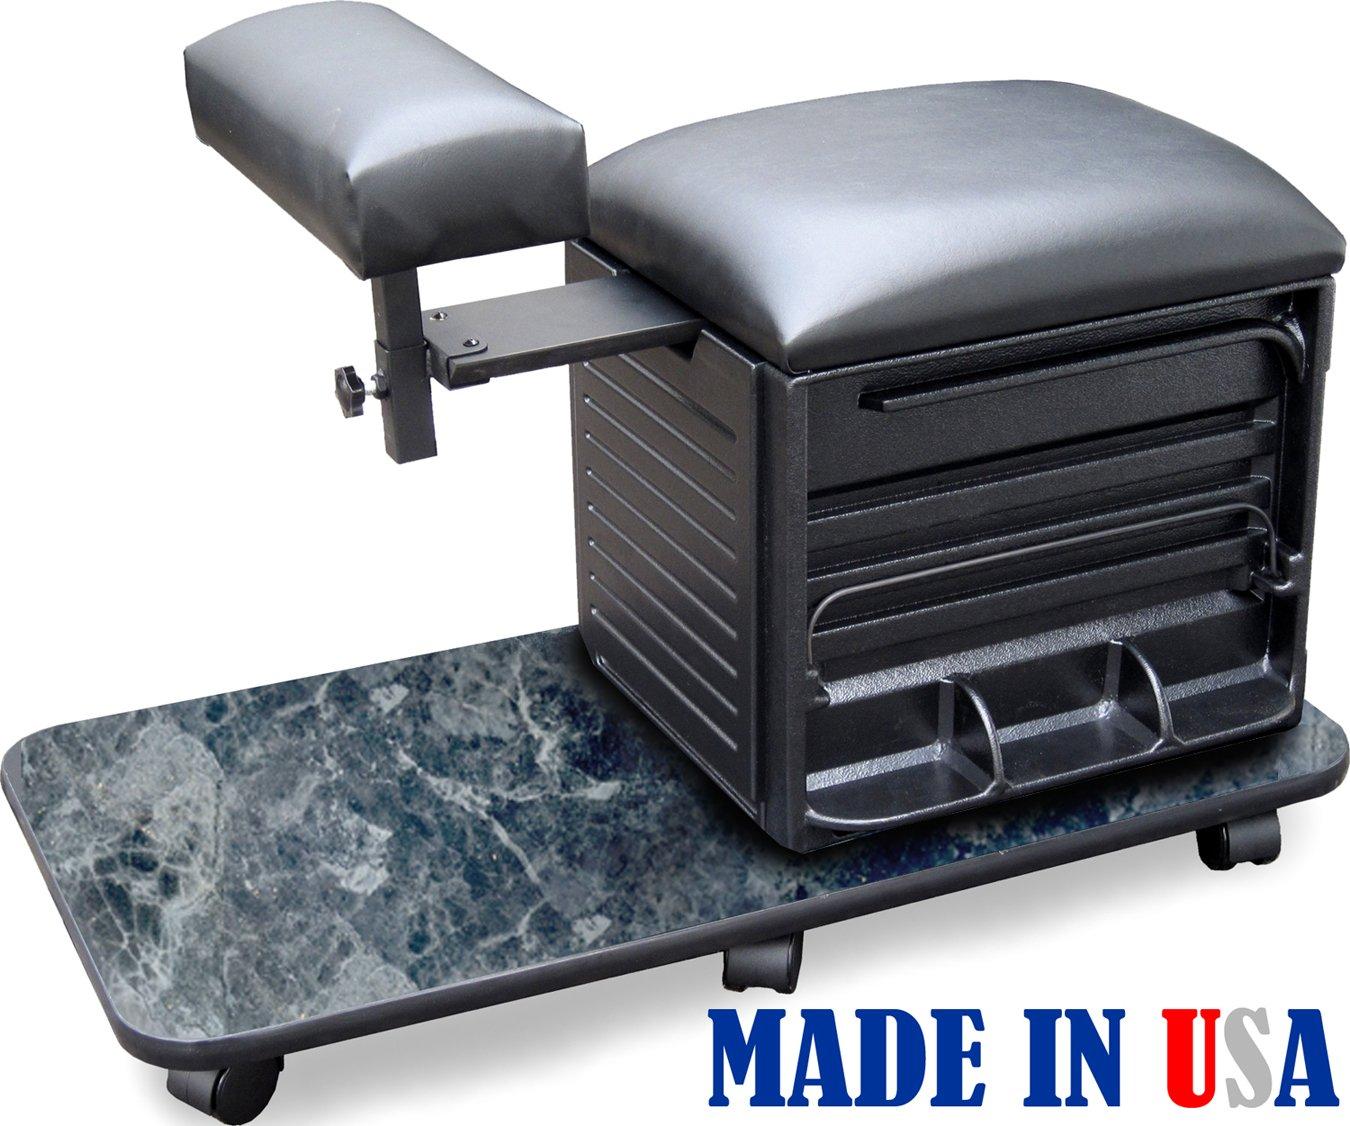 2317-HF BM Salon Spa Pedicure Nail Station Stool w/Footrest Made in USA by Dina Meri